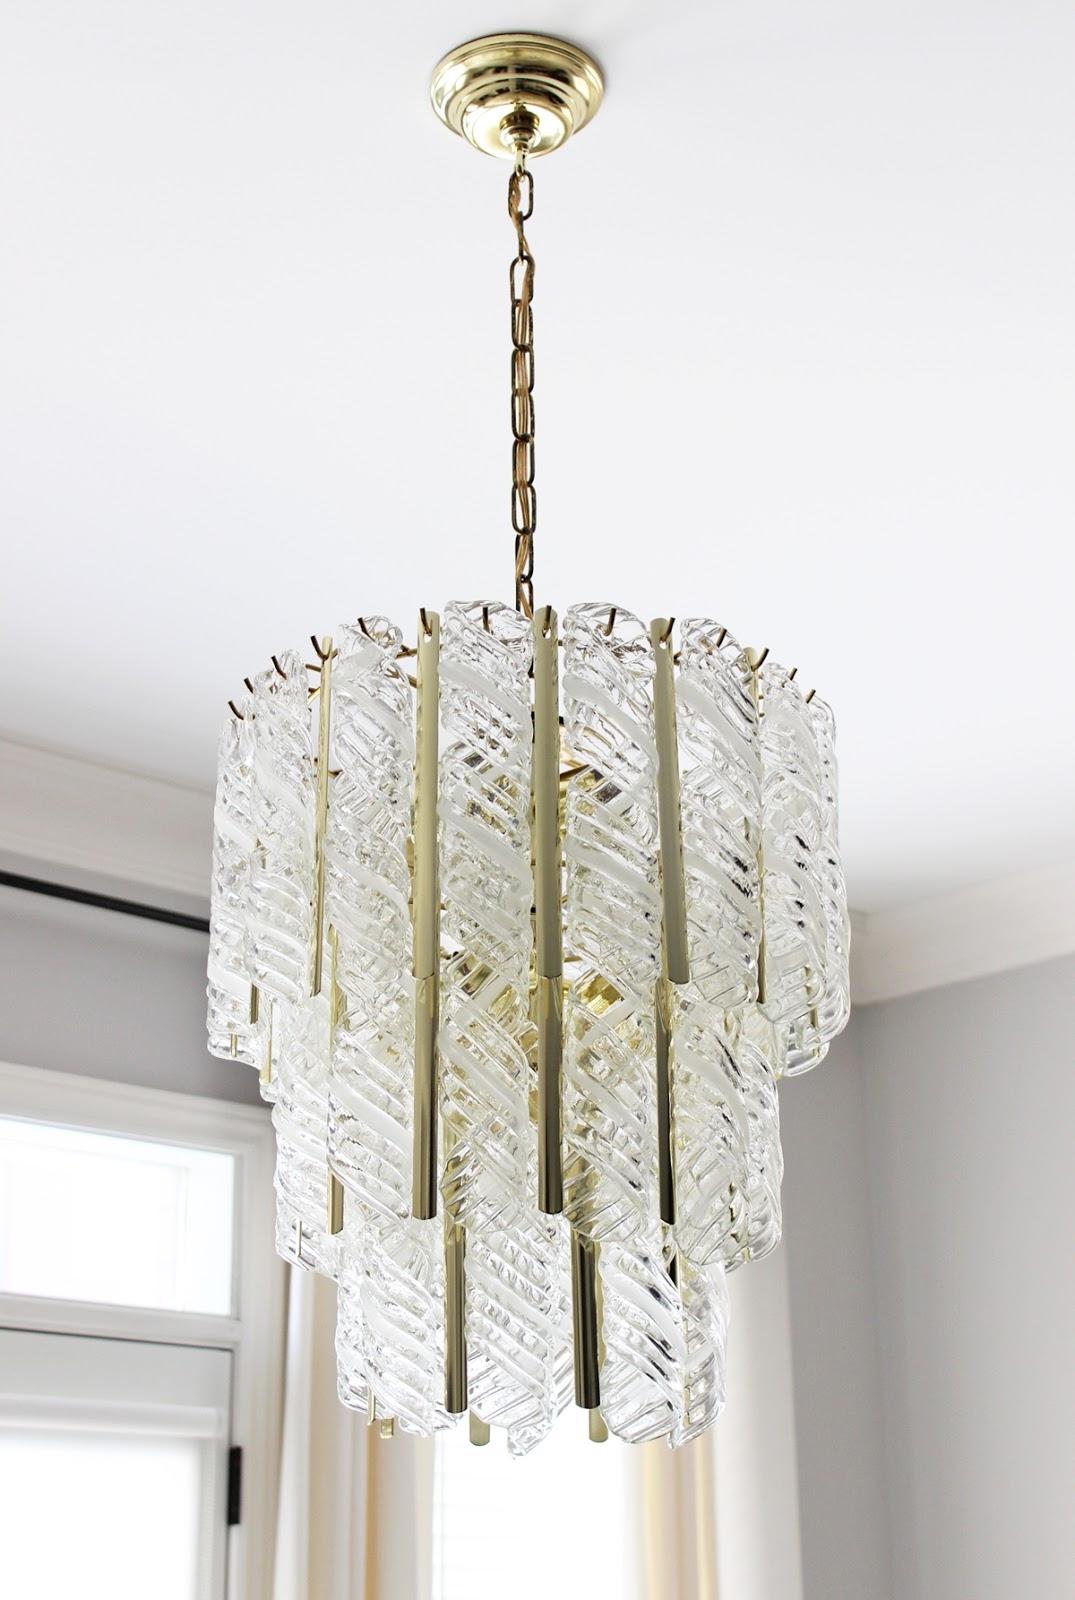 Vintage Venini Murano Glass Chandelier Am Dolce Vita Pinterest Regarding Murano Chandelier Replica (View 12 of 15)